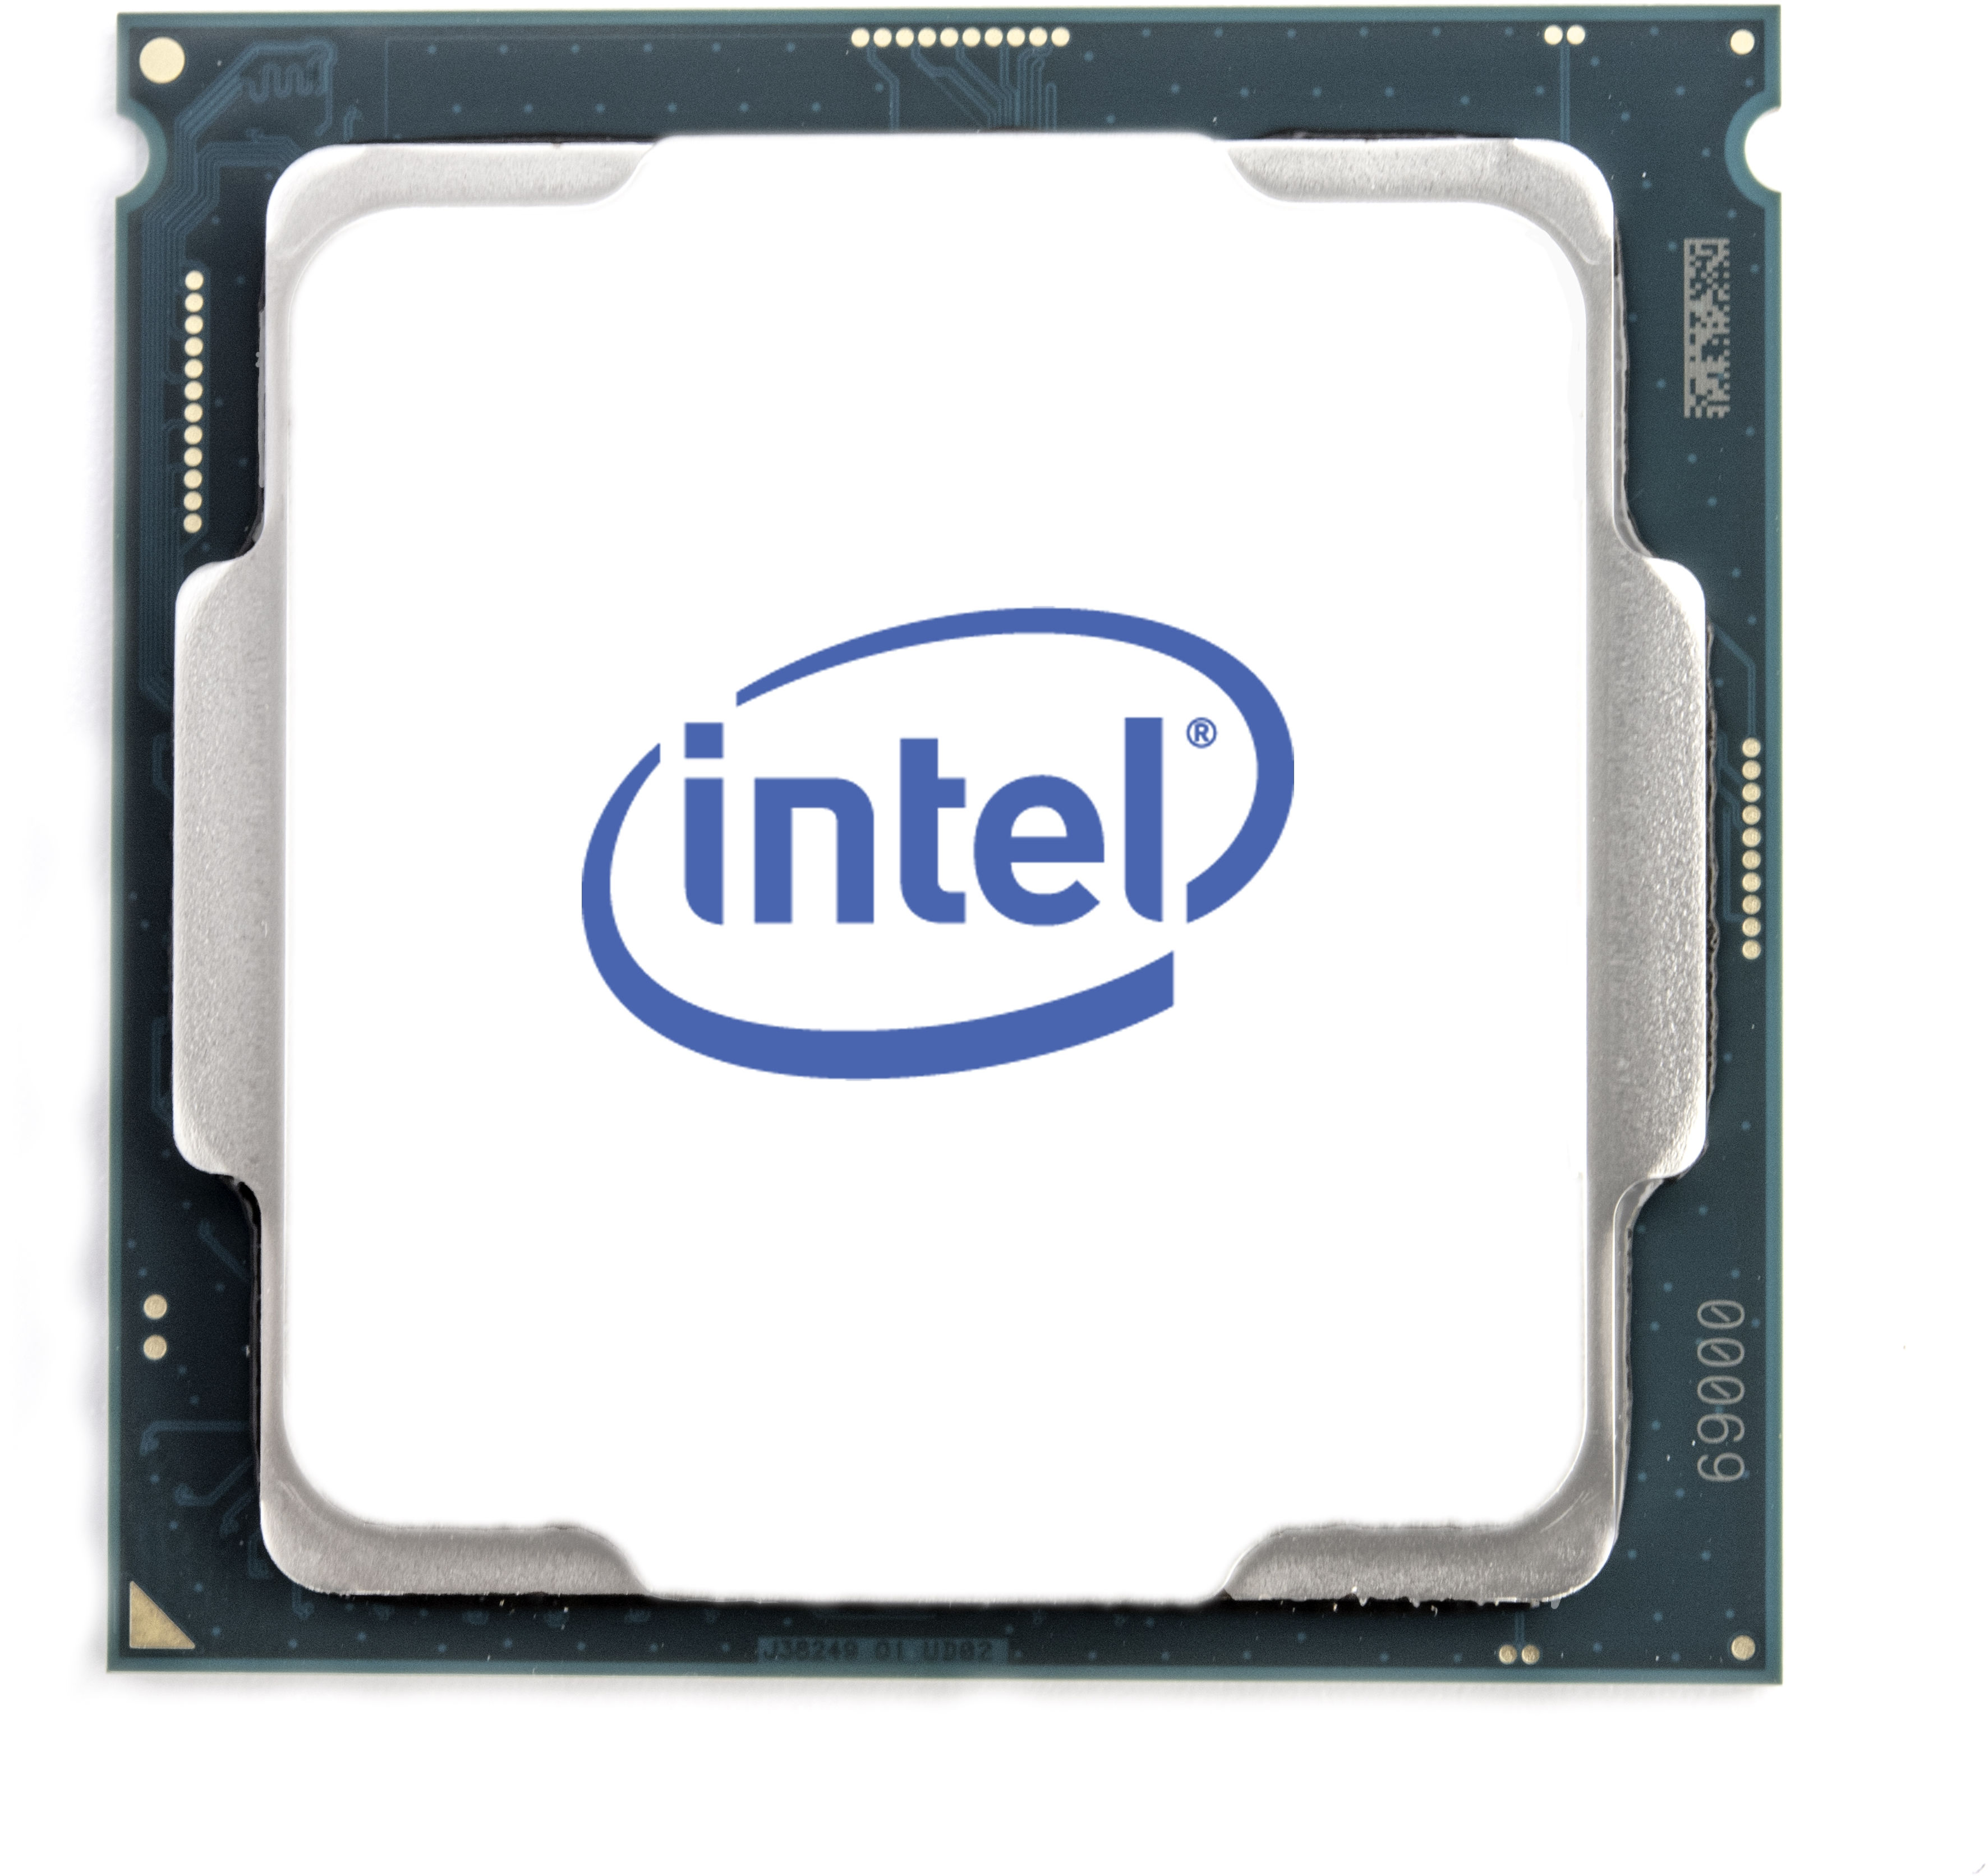 INTEL Xeon Silver 4214R 2.40 GHz 12/24 Cores/Threads 16.5M Cache